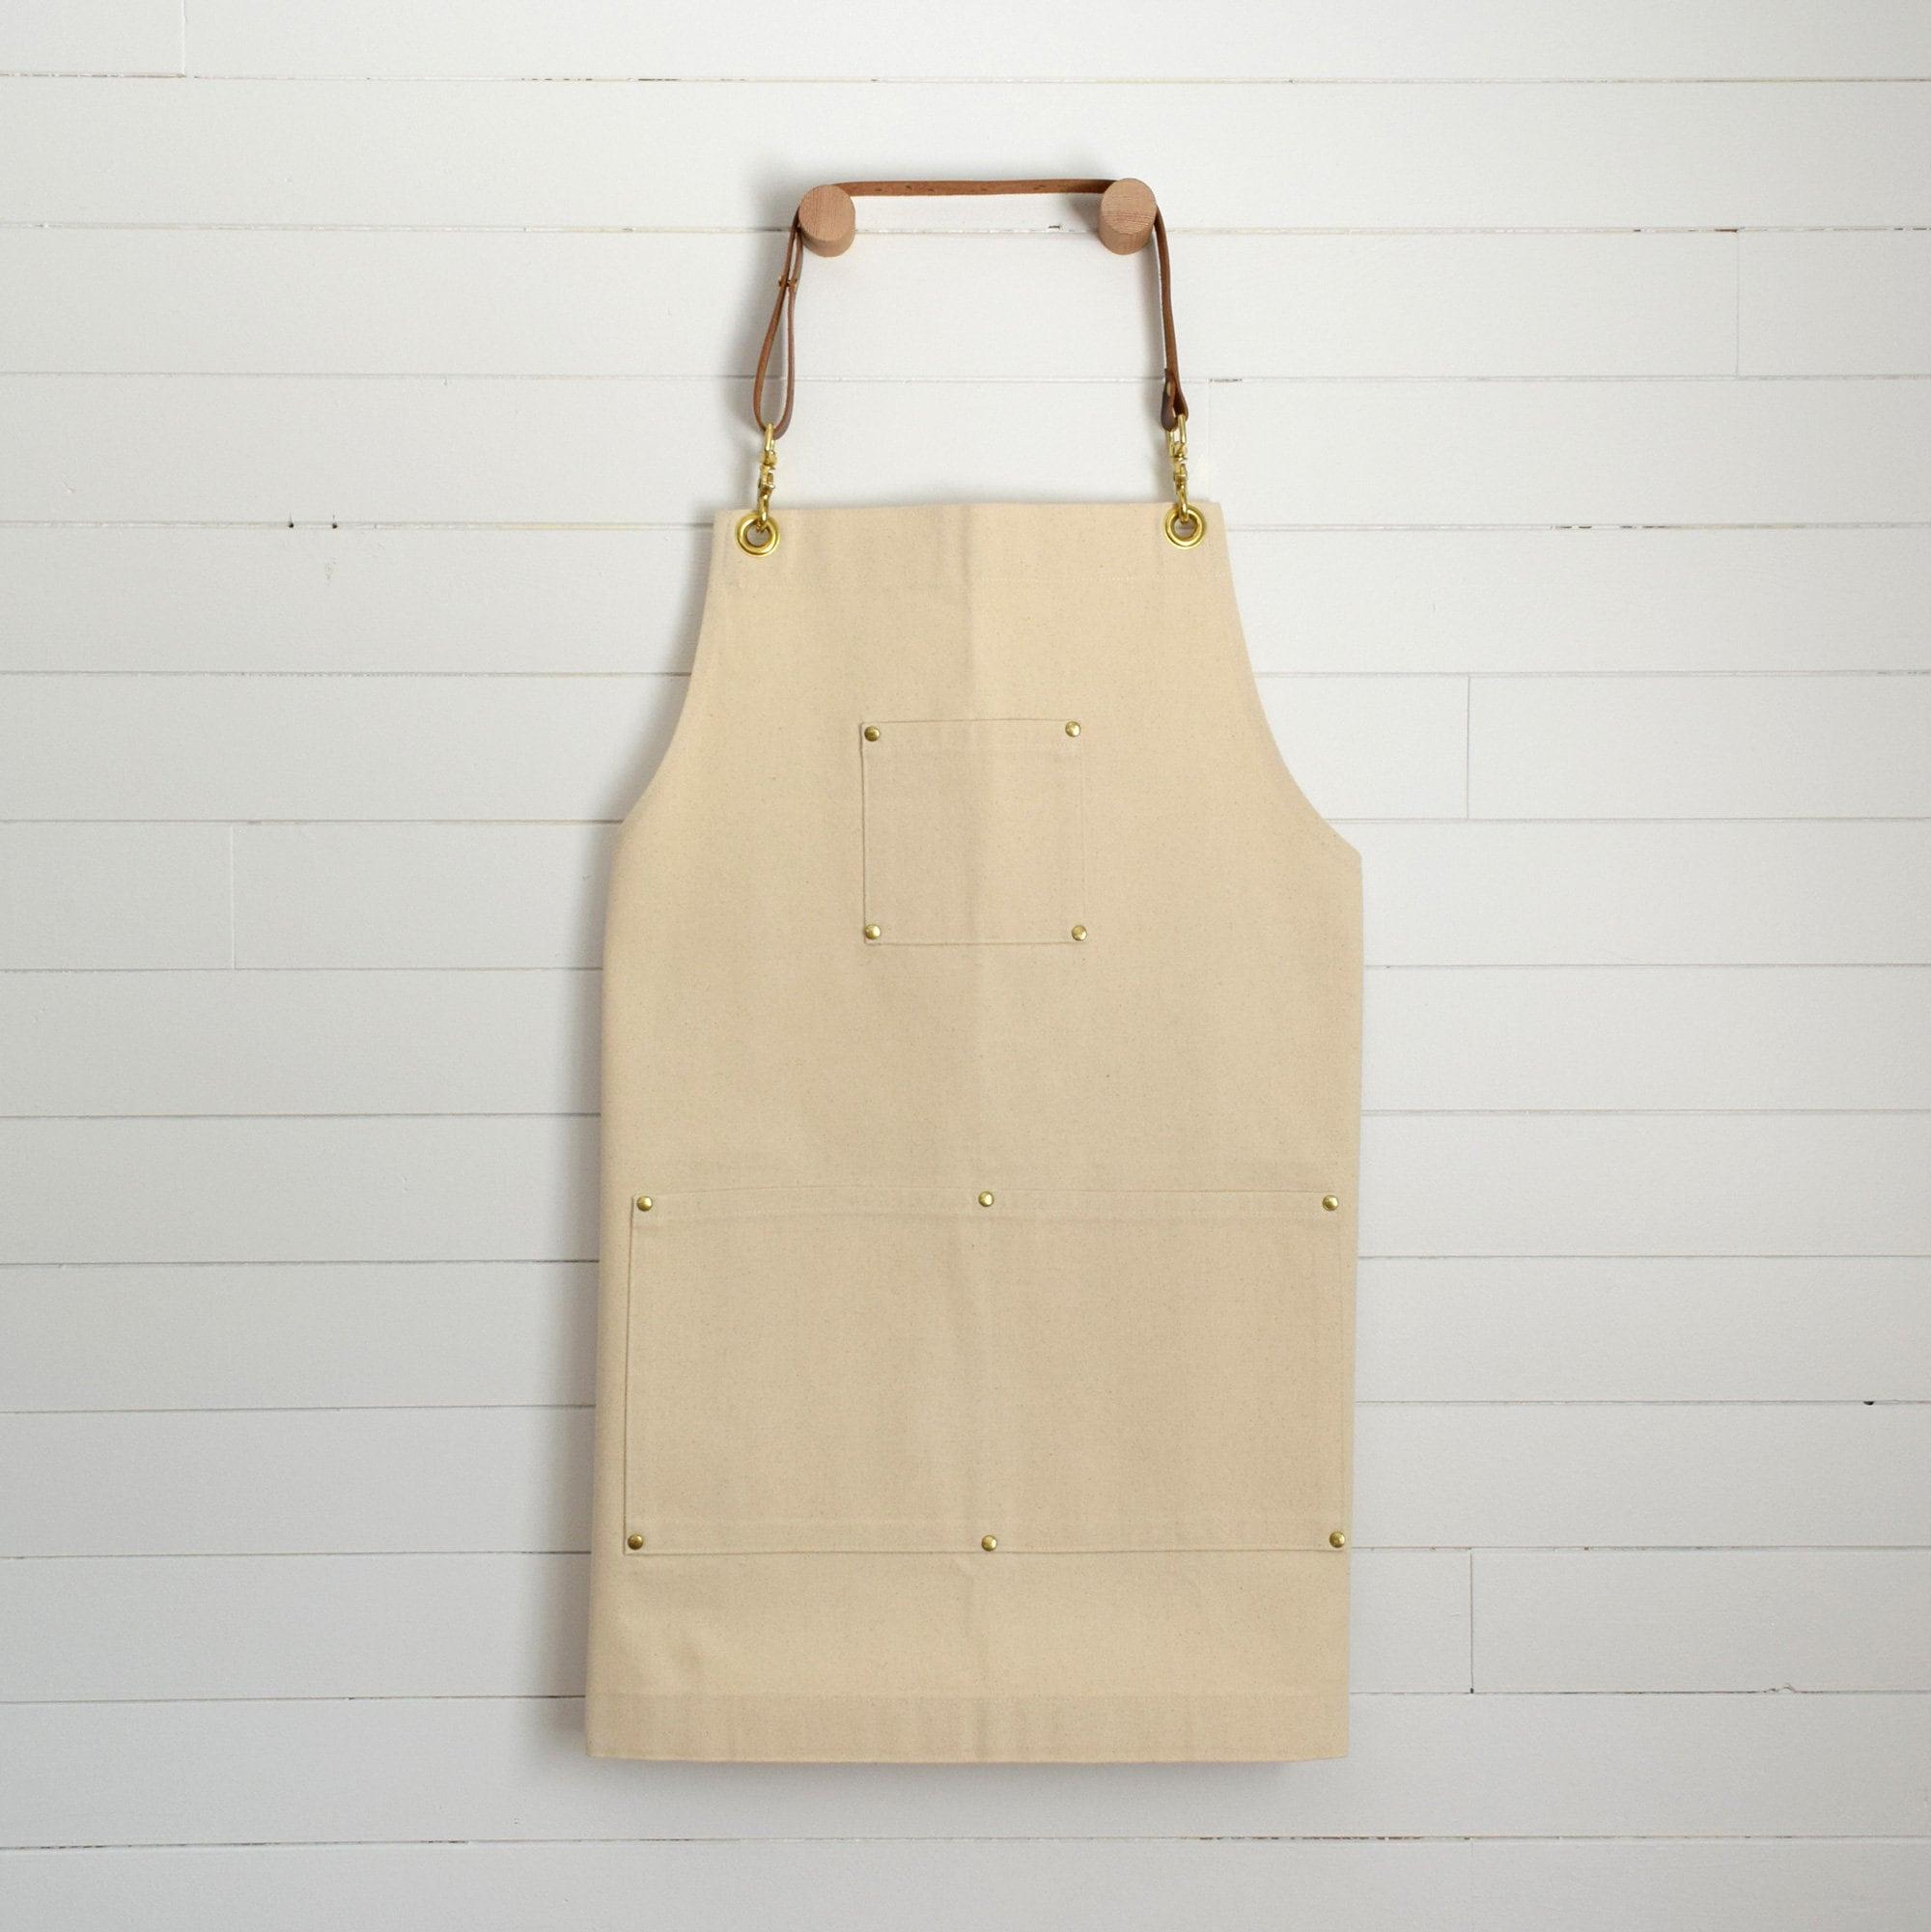 Craftsman Apron   Cream Cotton Canvas, Leather Straps